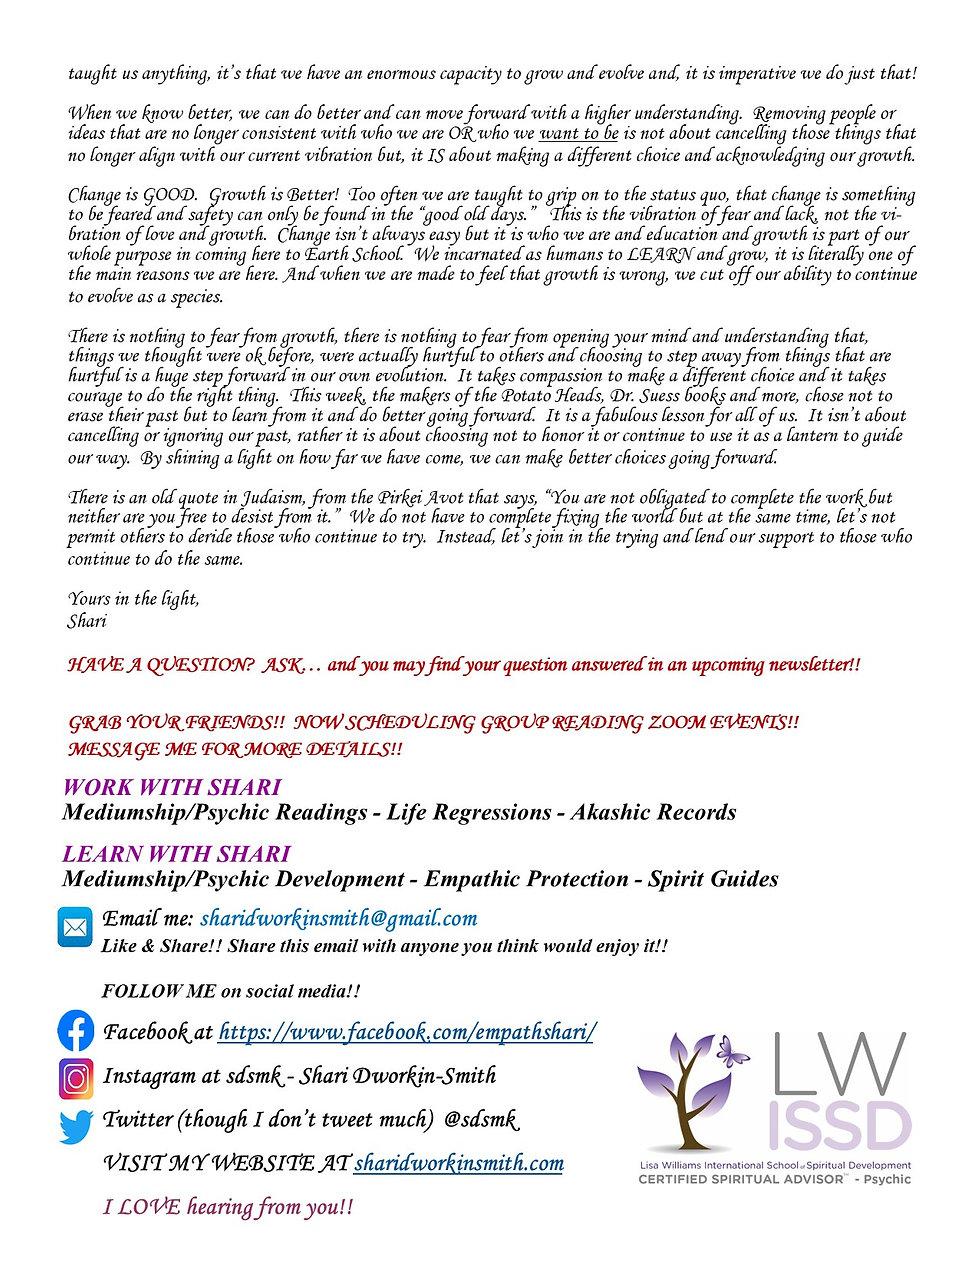 SDS - PME Newsletter - March 2021 - p2.j